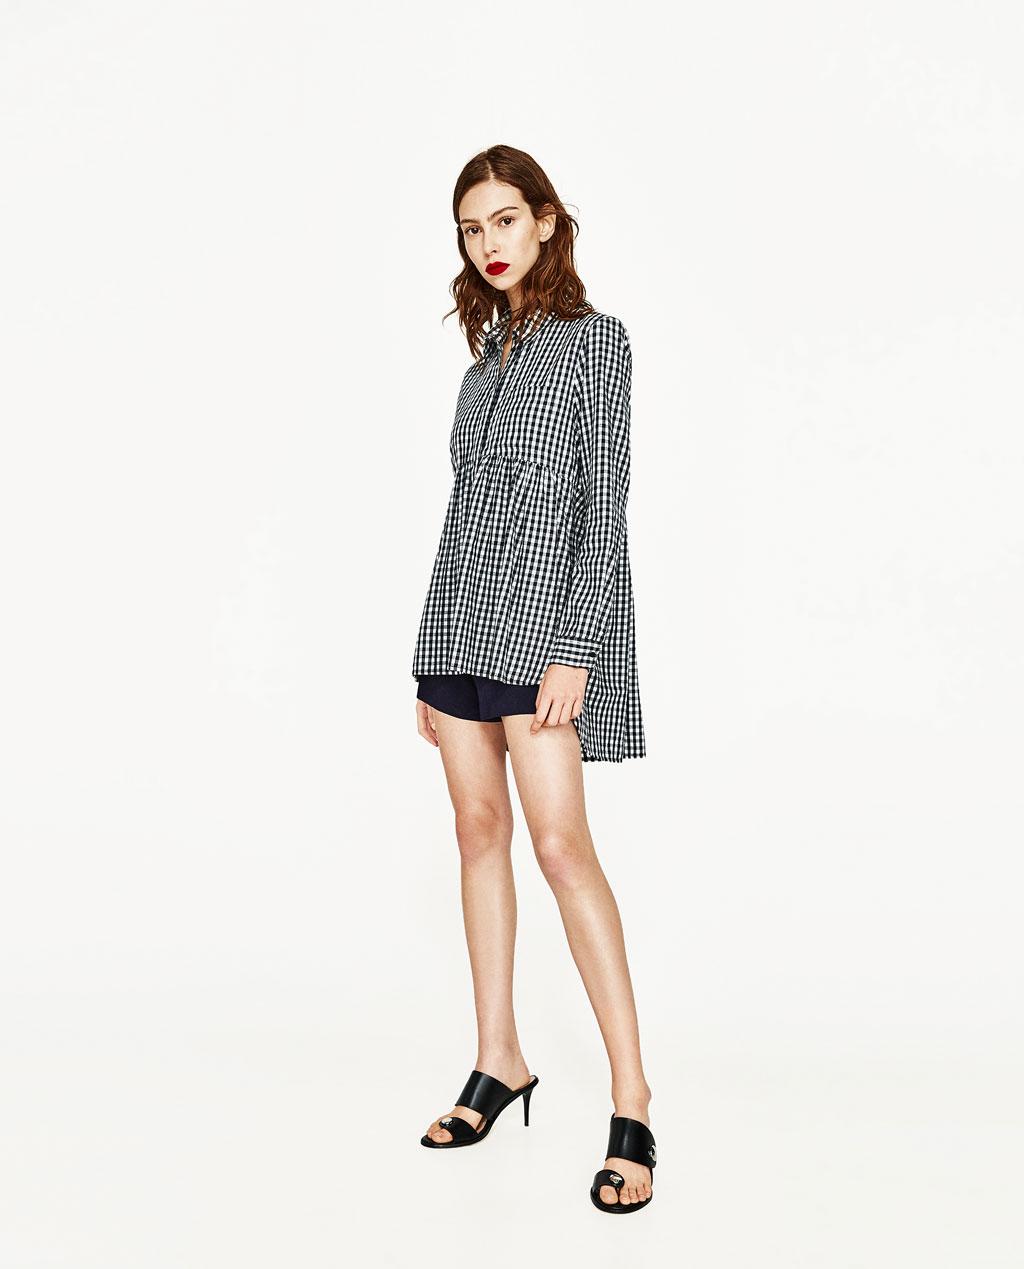 Women's Babydoll Gingham Shirt: Sale $24.95, Regular $49.90